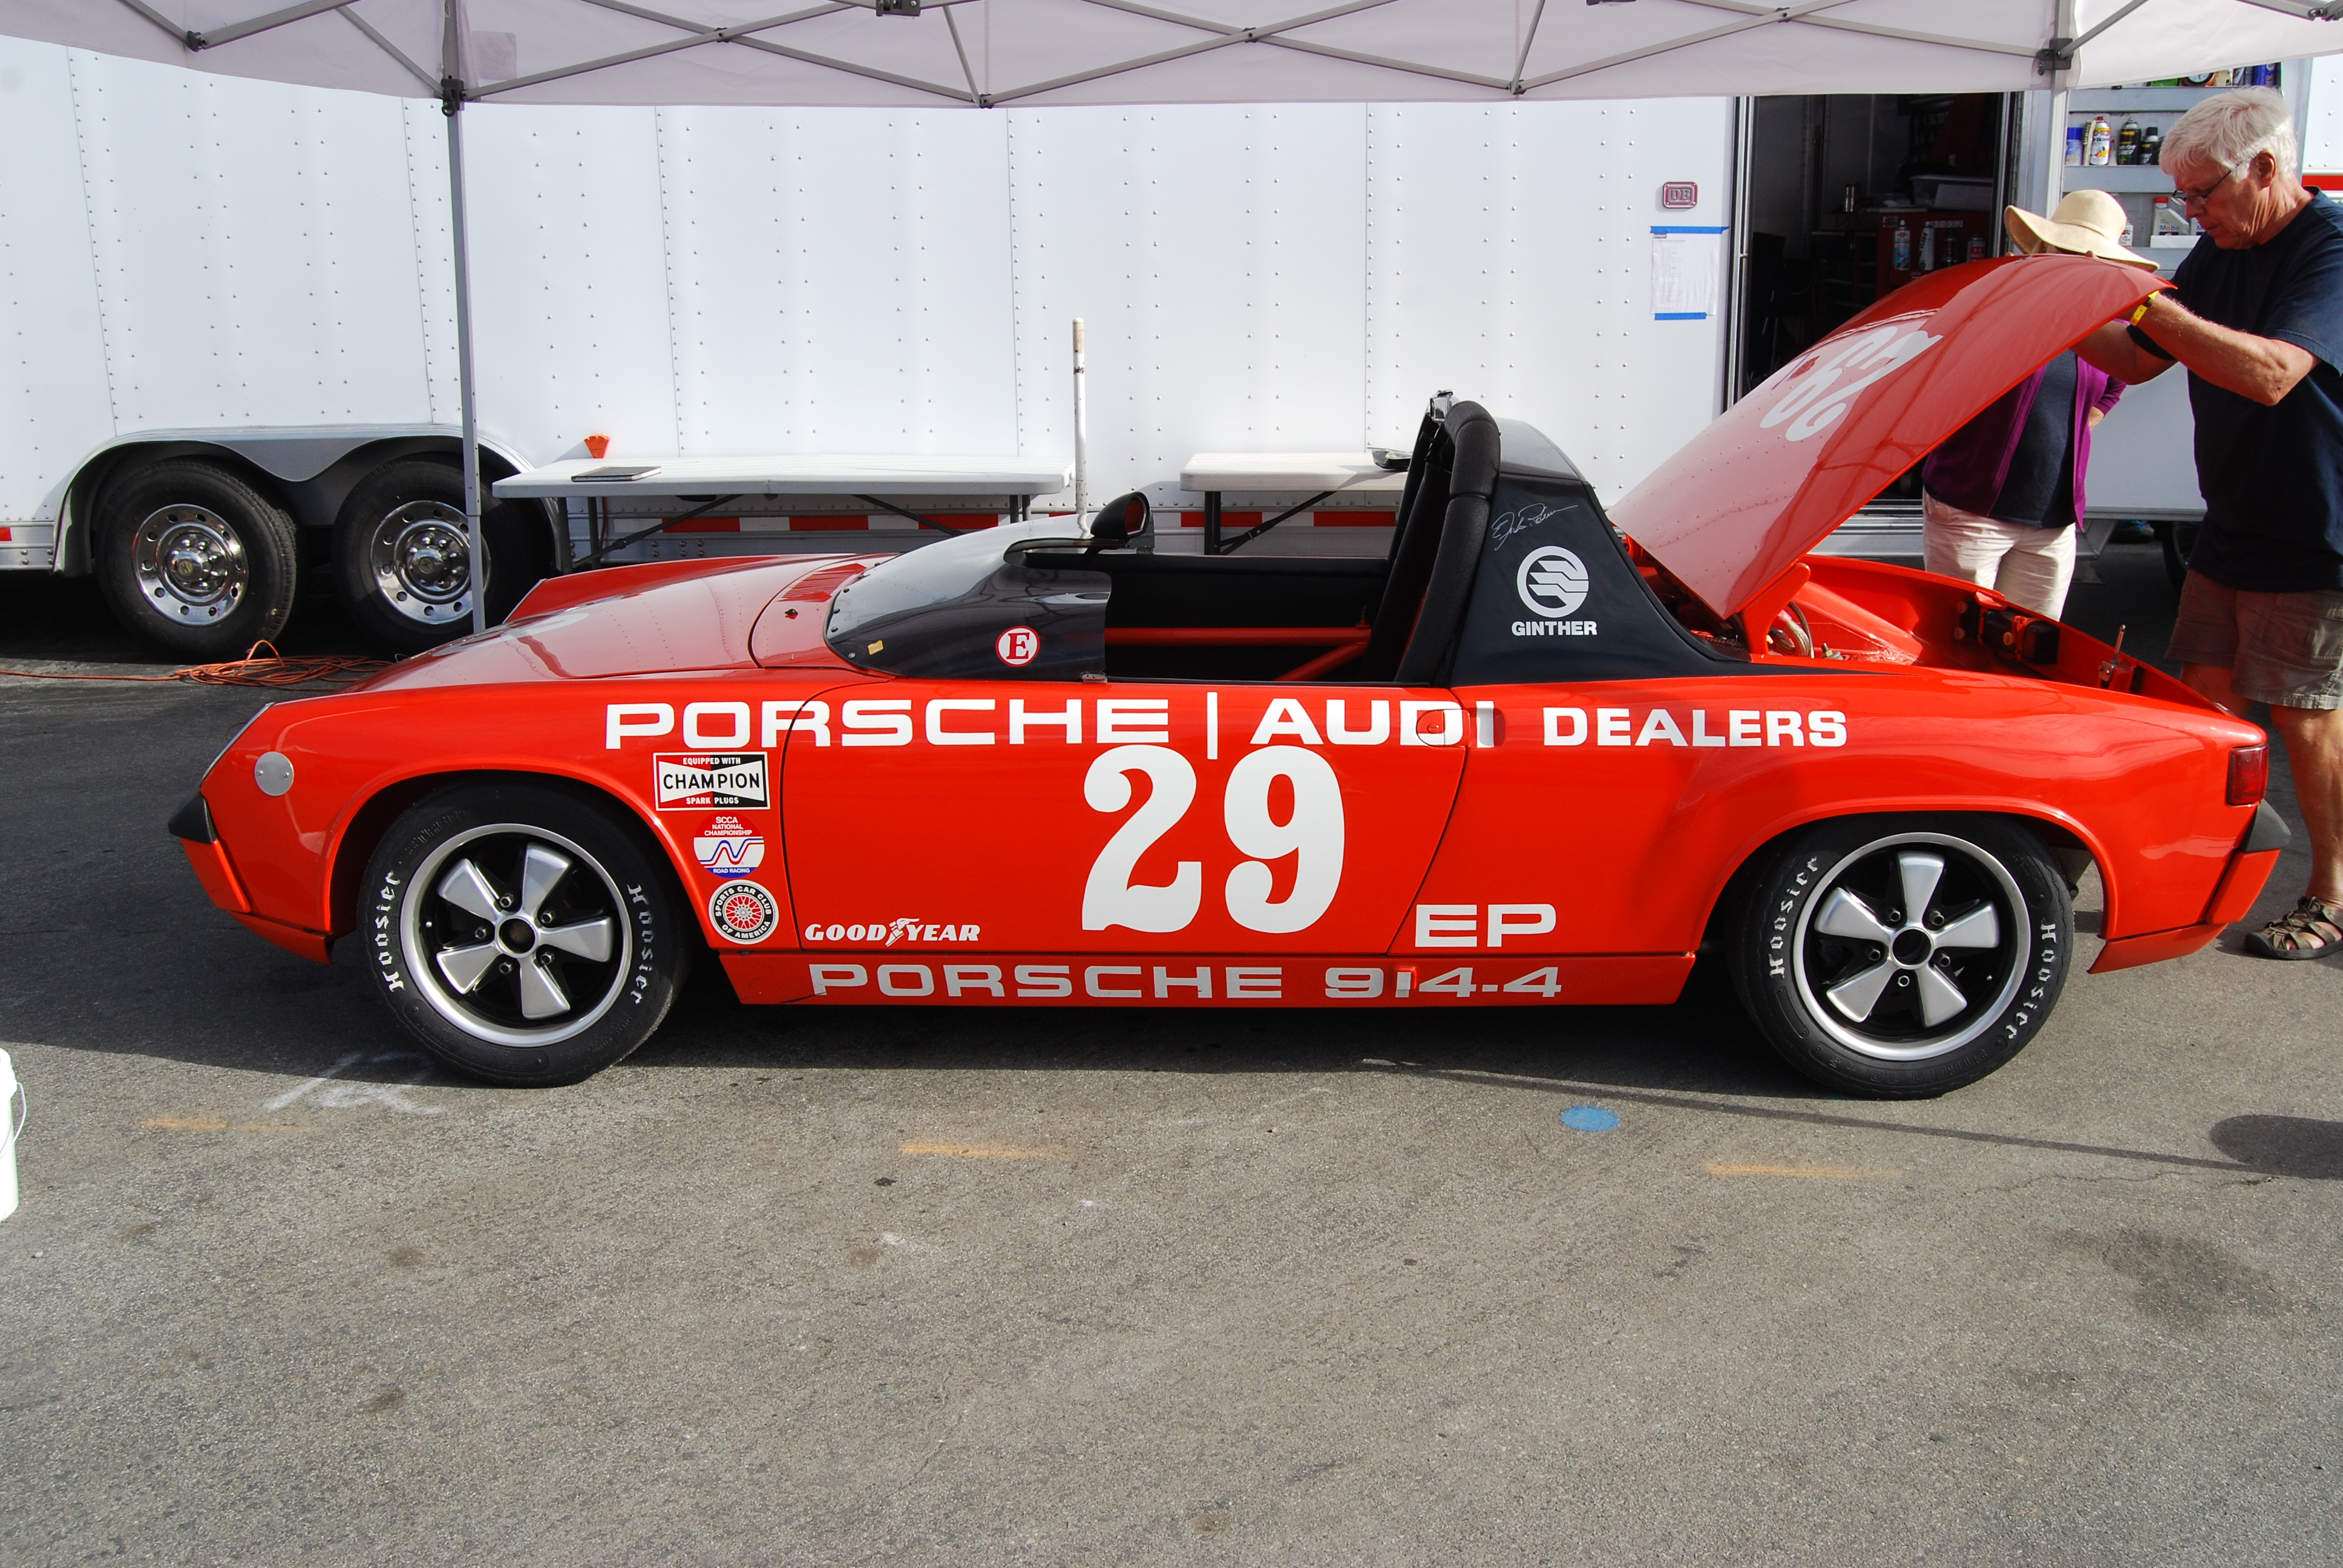 File Flickr Wbaiv Ritchie Ginther Vw Porsche E